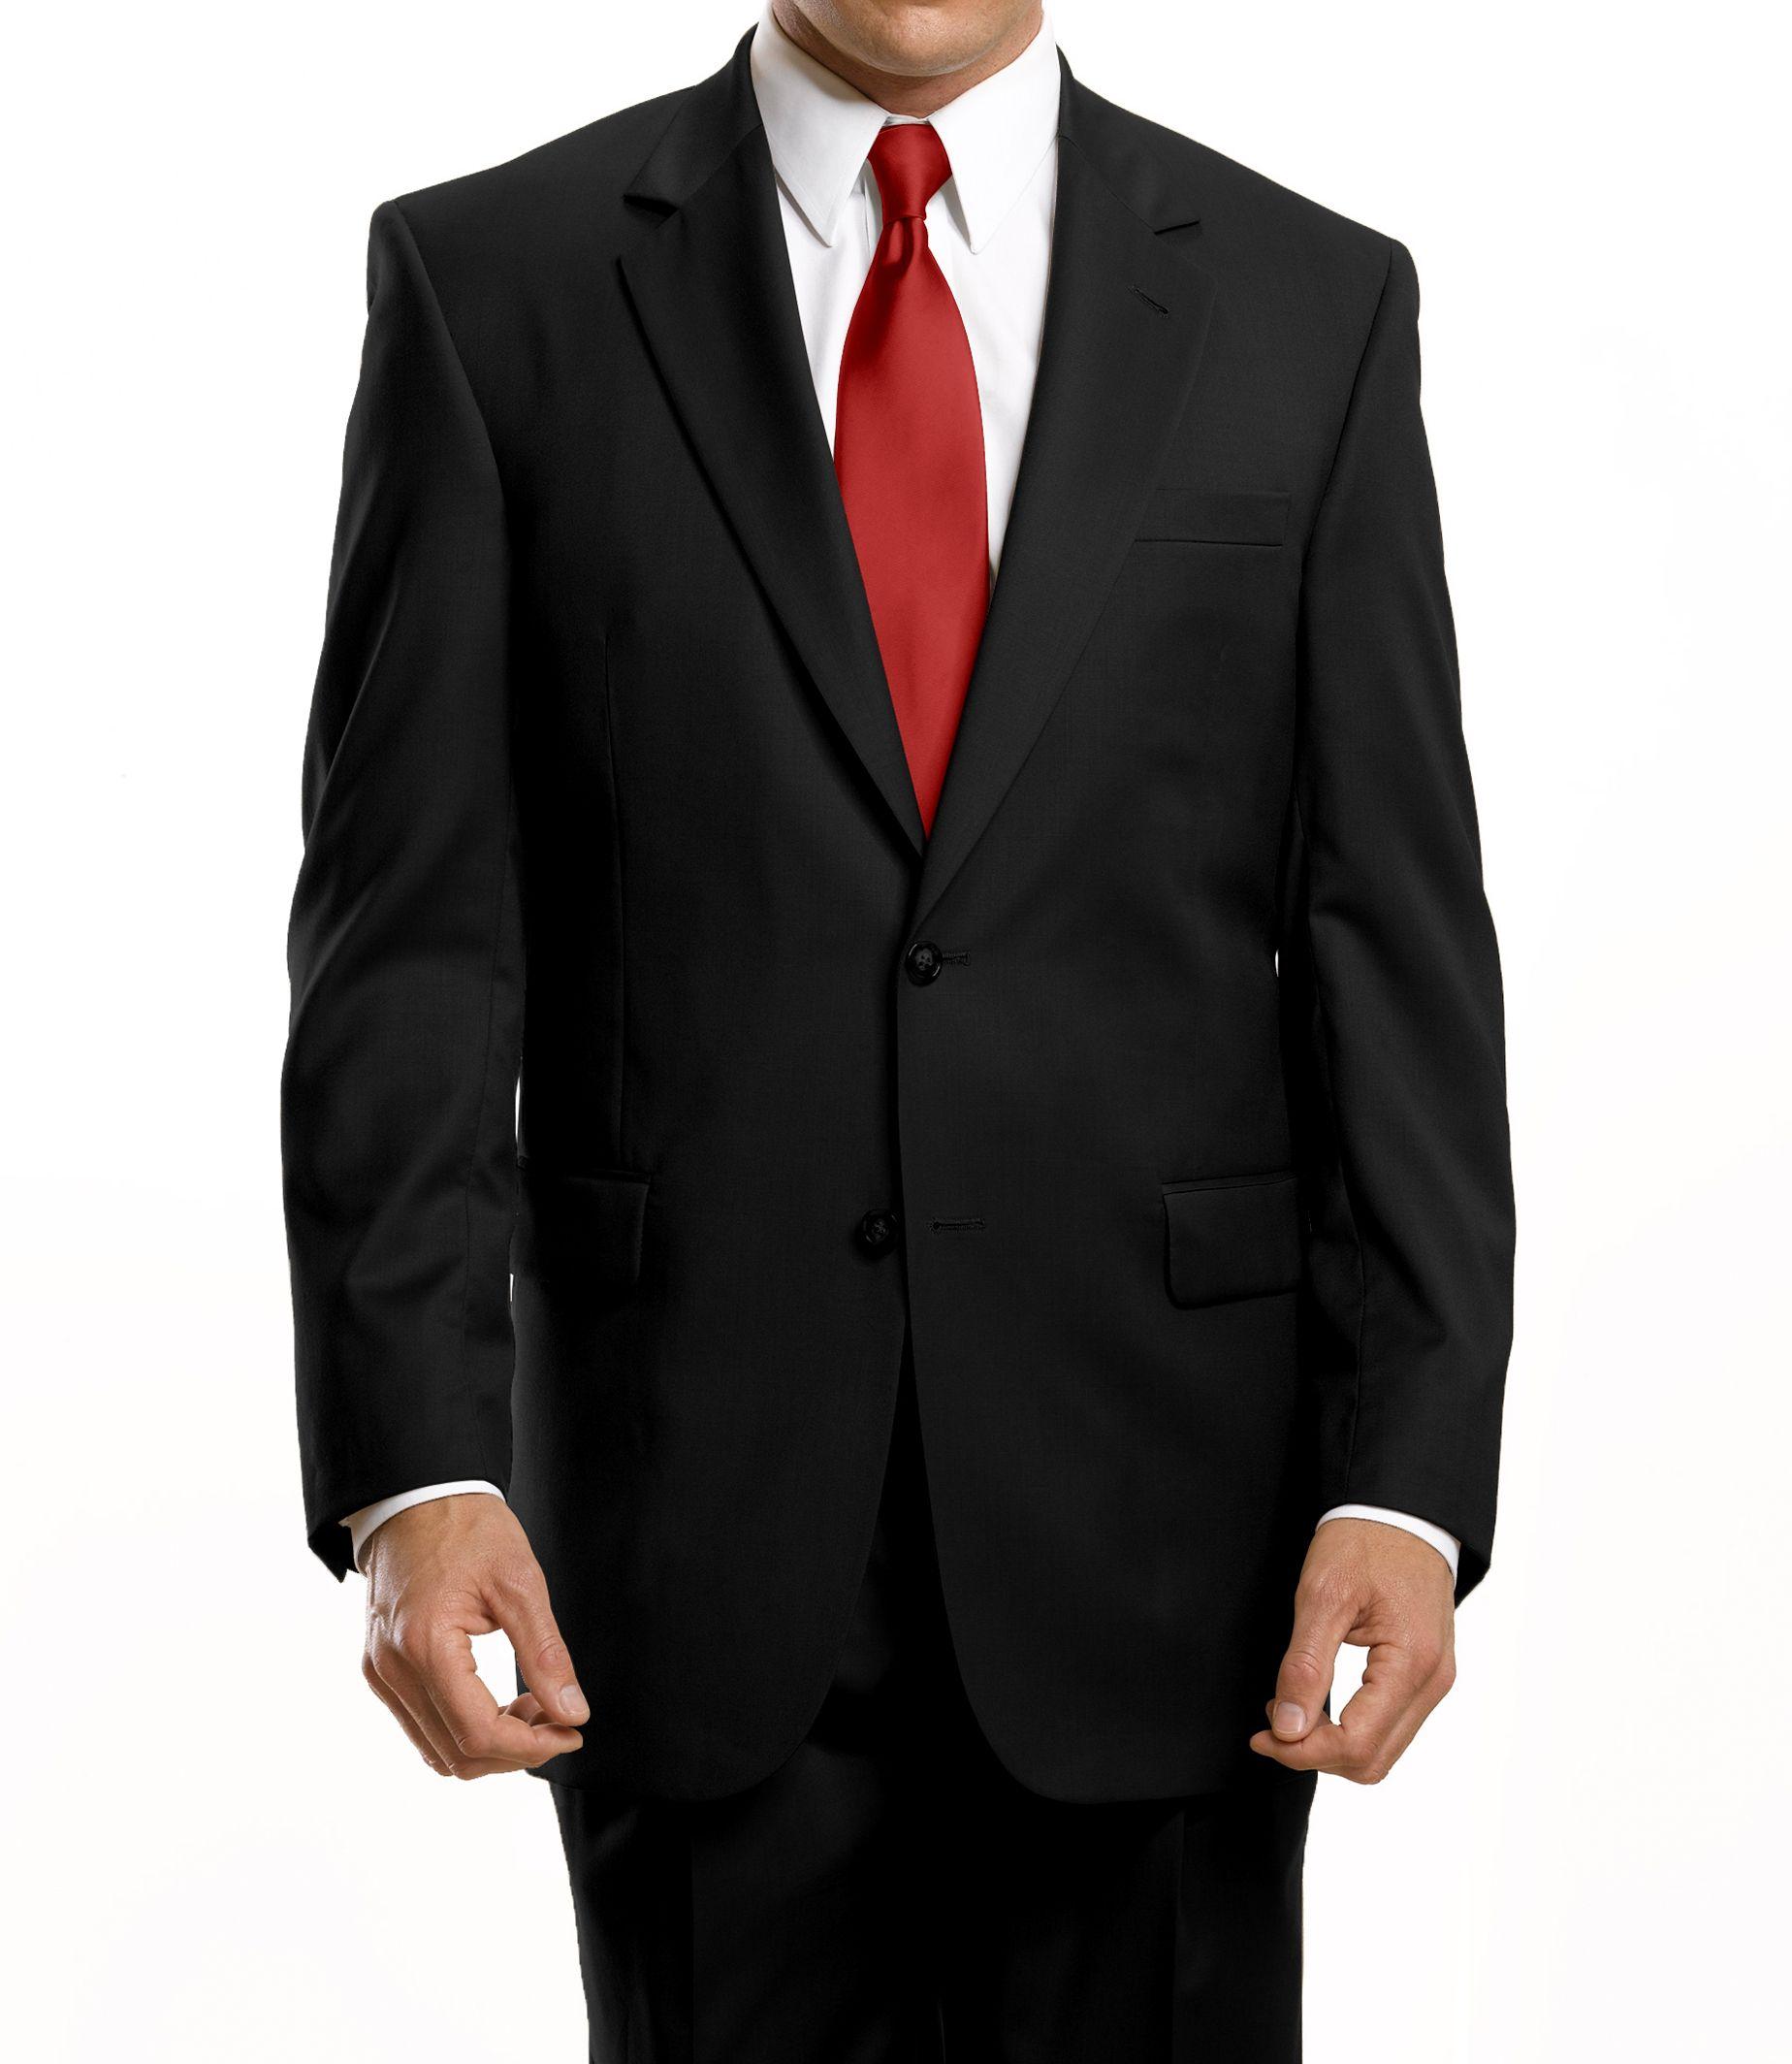 Signature 2-Button Wool Suit- Sizes 44 X-Long-52- Black, Grey